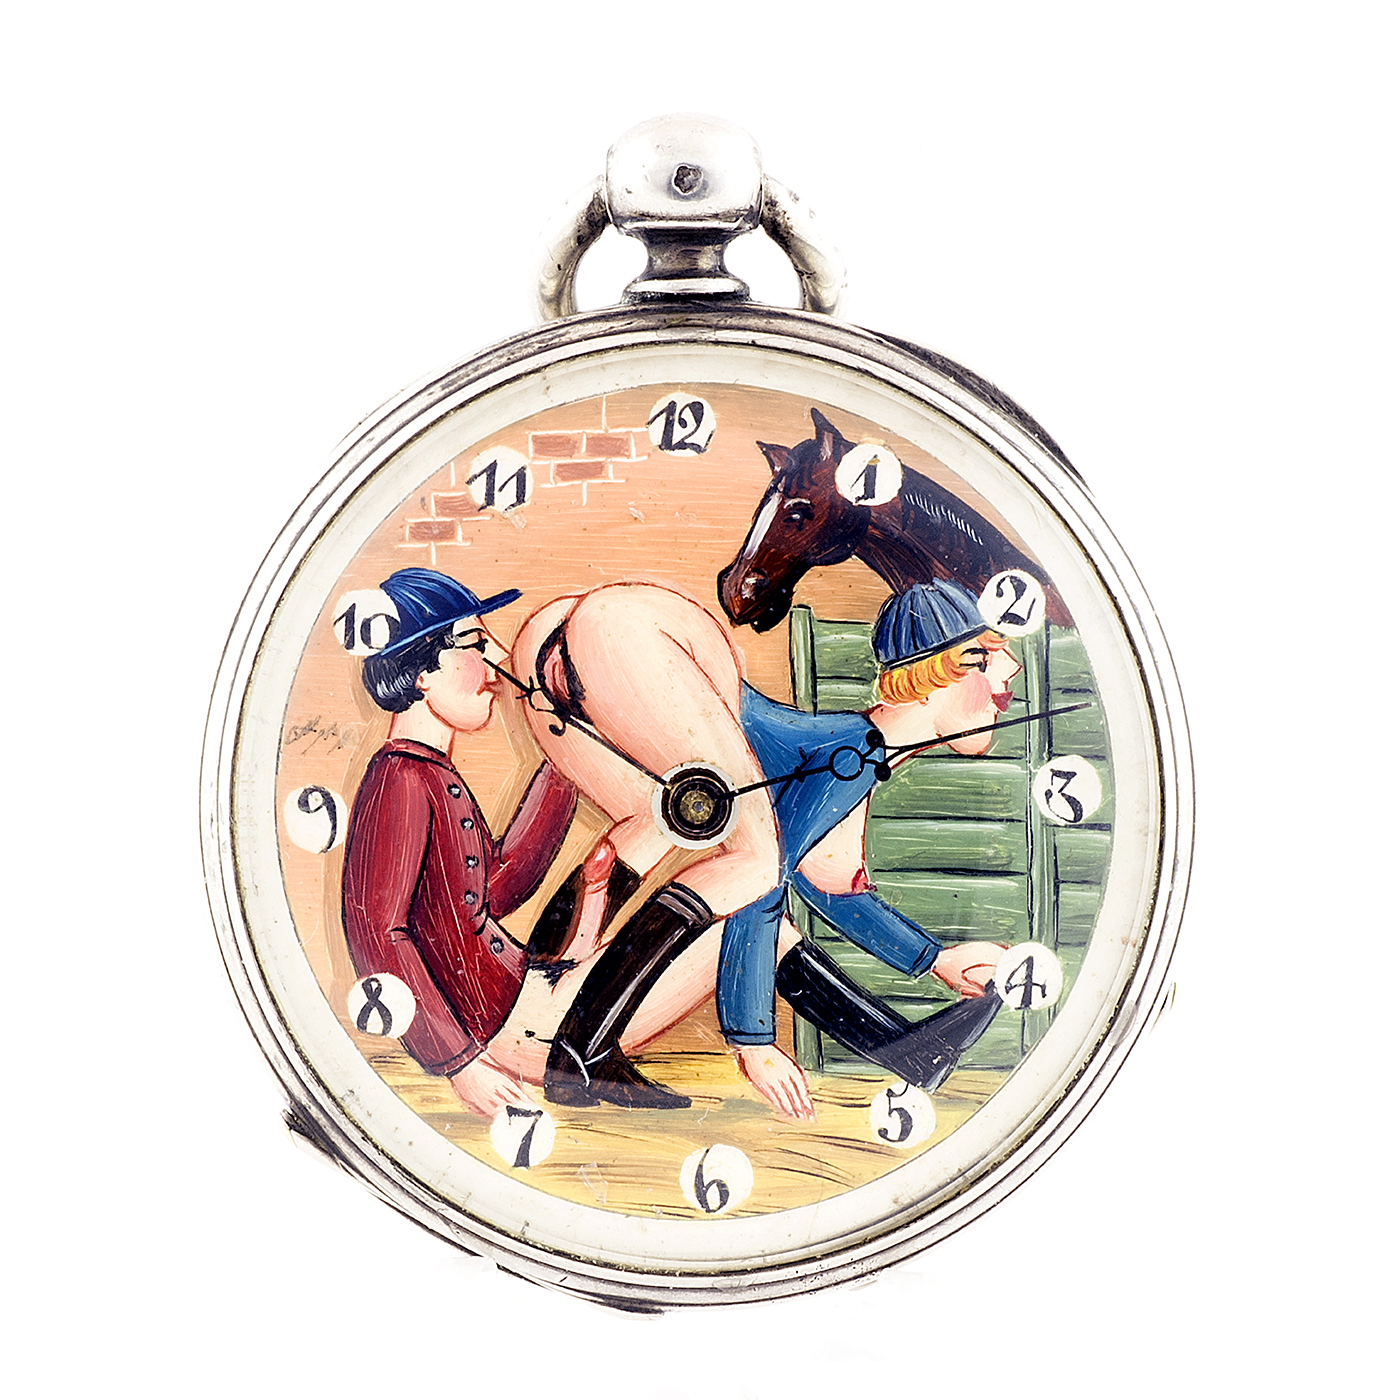 Reloj Erótico de Bolsillo, lepine. Automatón. Suiza, ca. 1925.